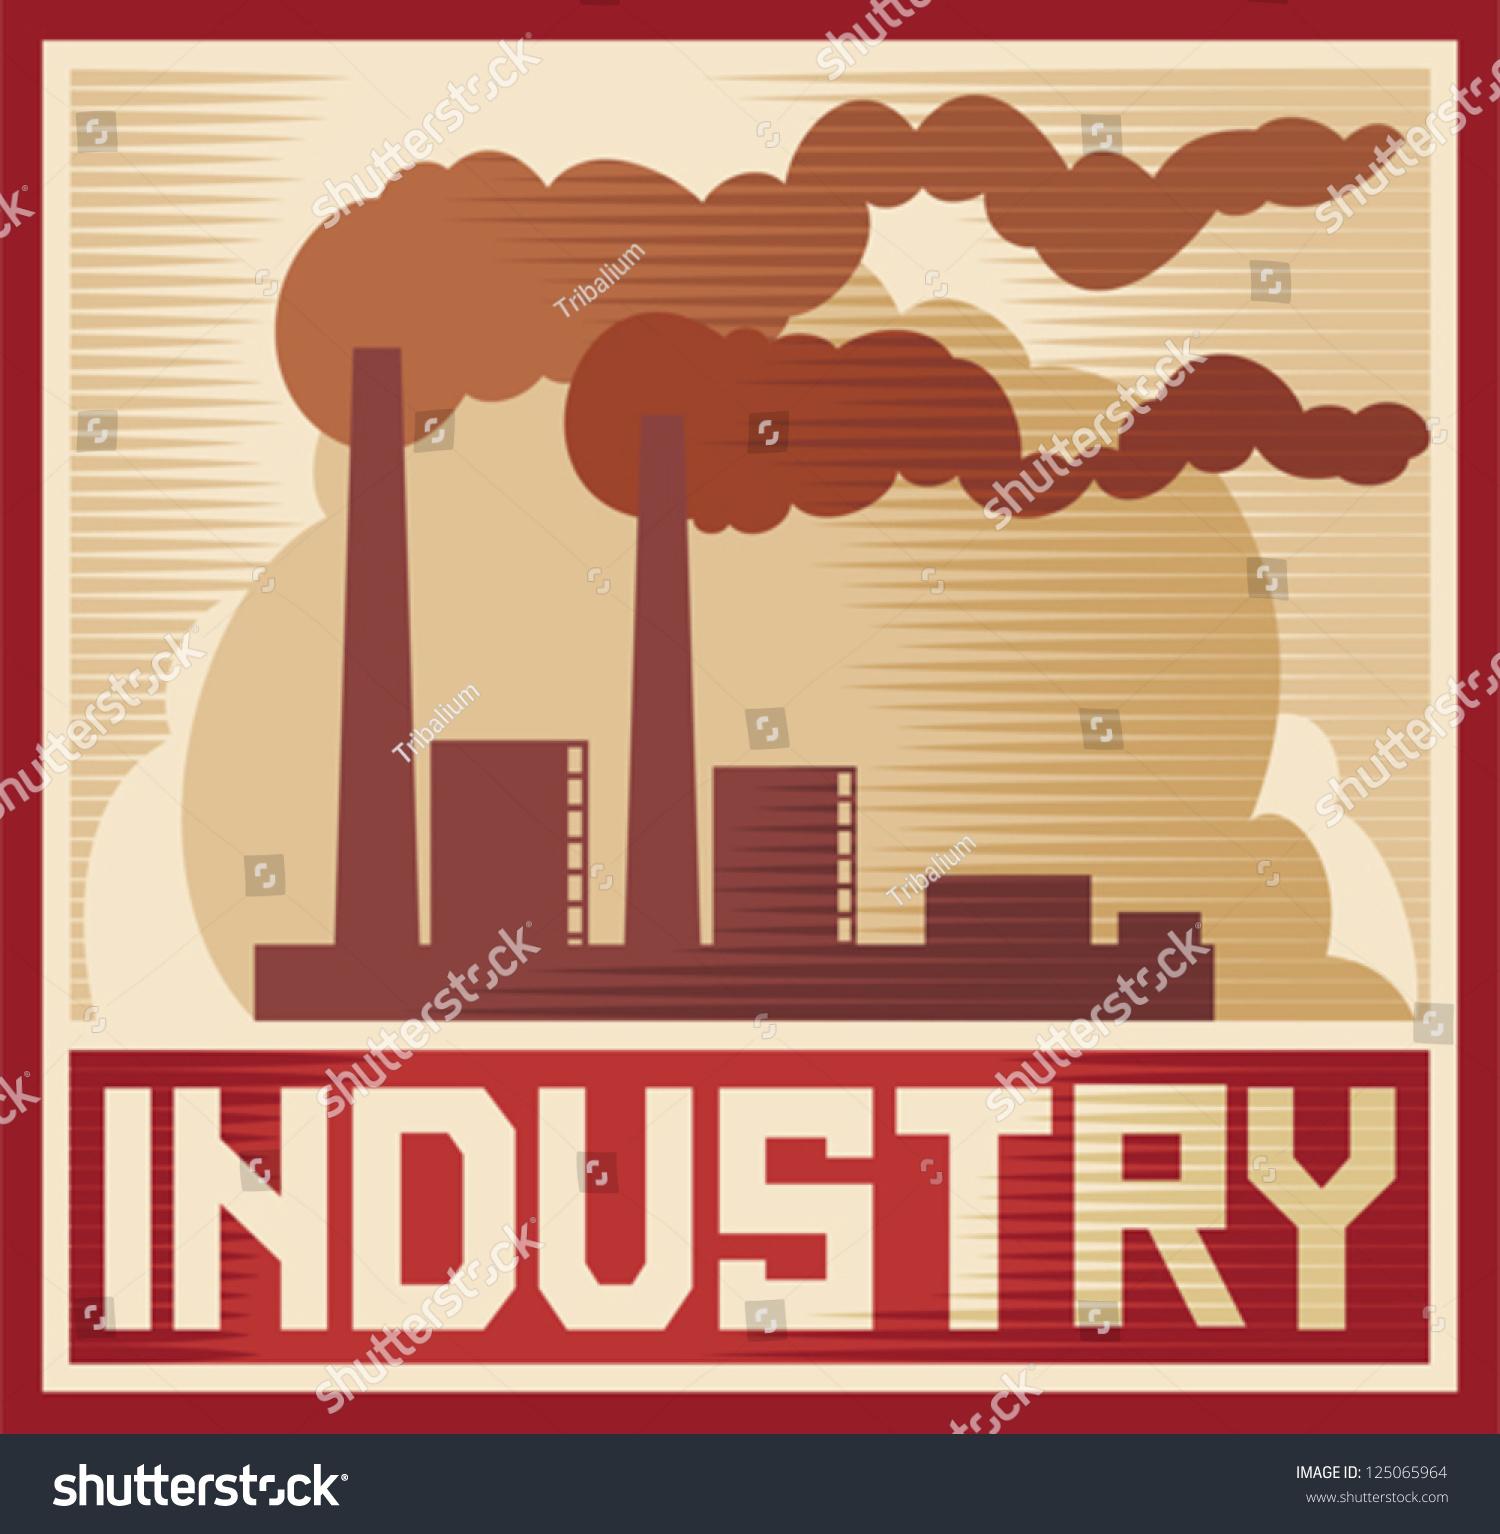 Industry Poster Stock Vector 125065964 - Shutterstock